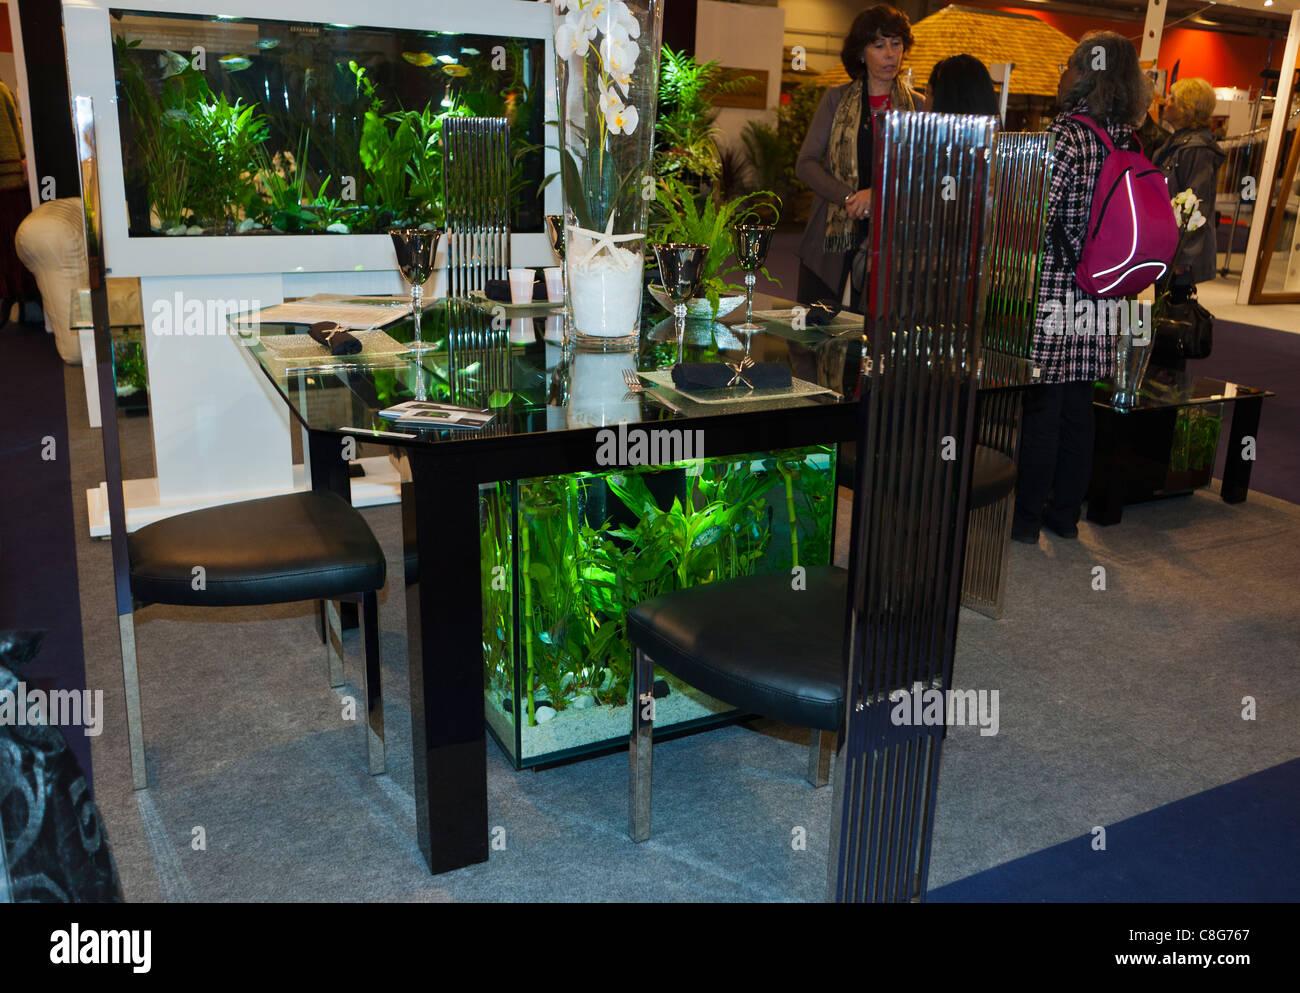 Paris France Glass Aquarium Dining Table on display in Consumer